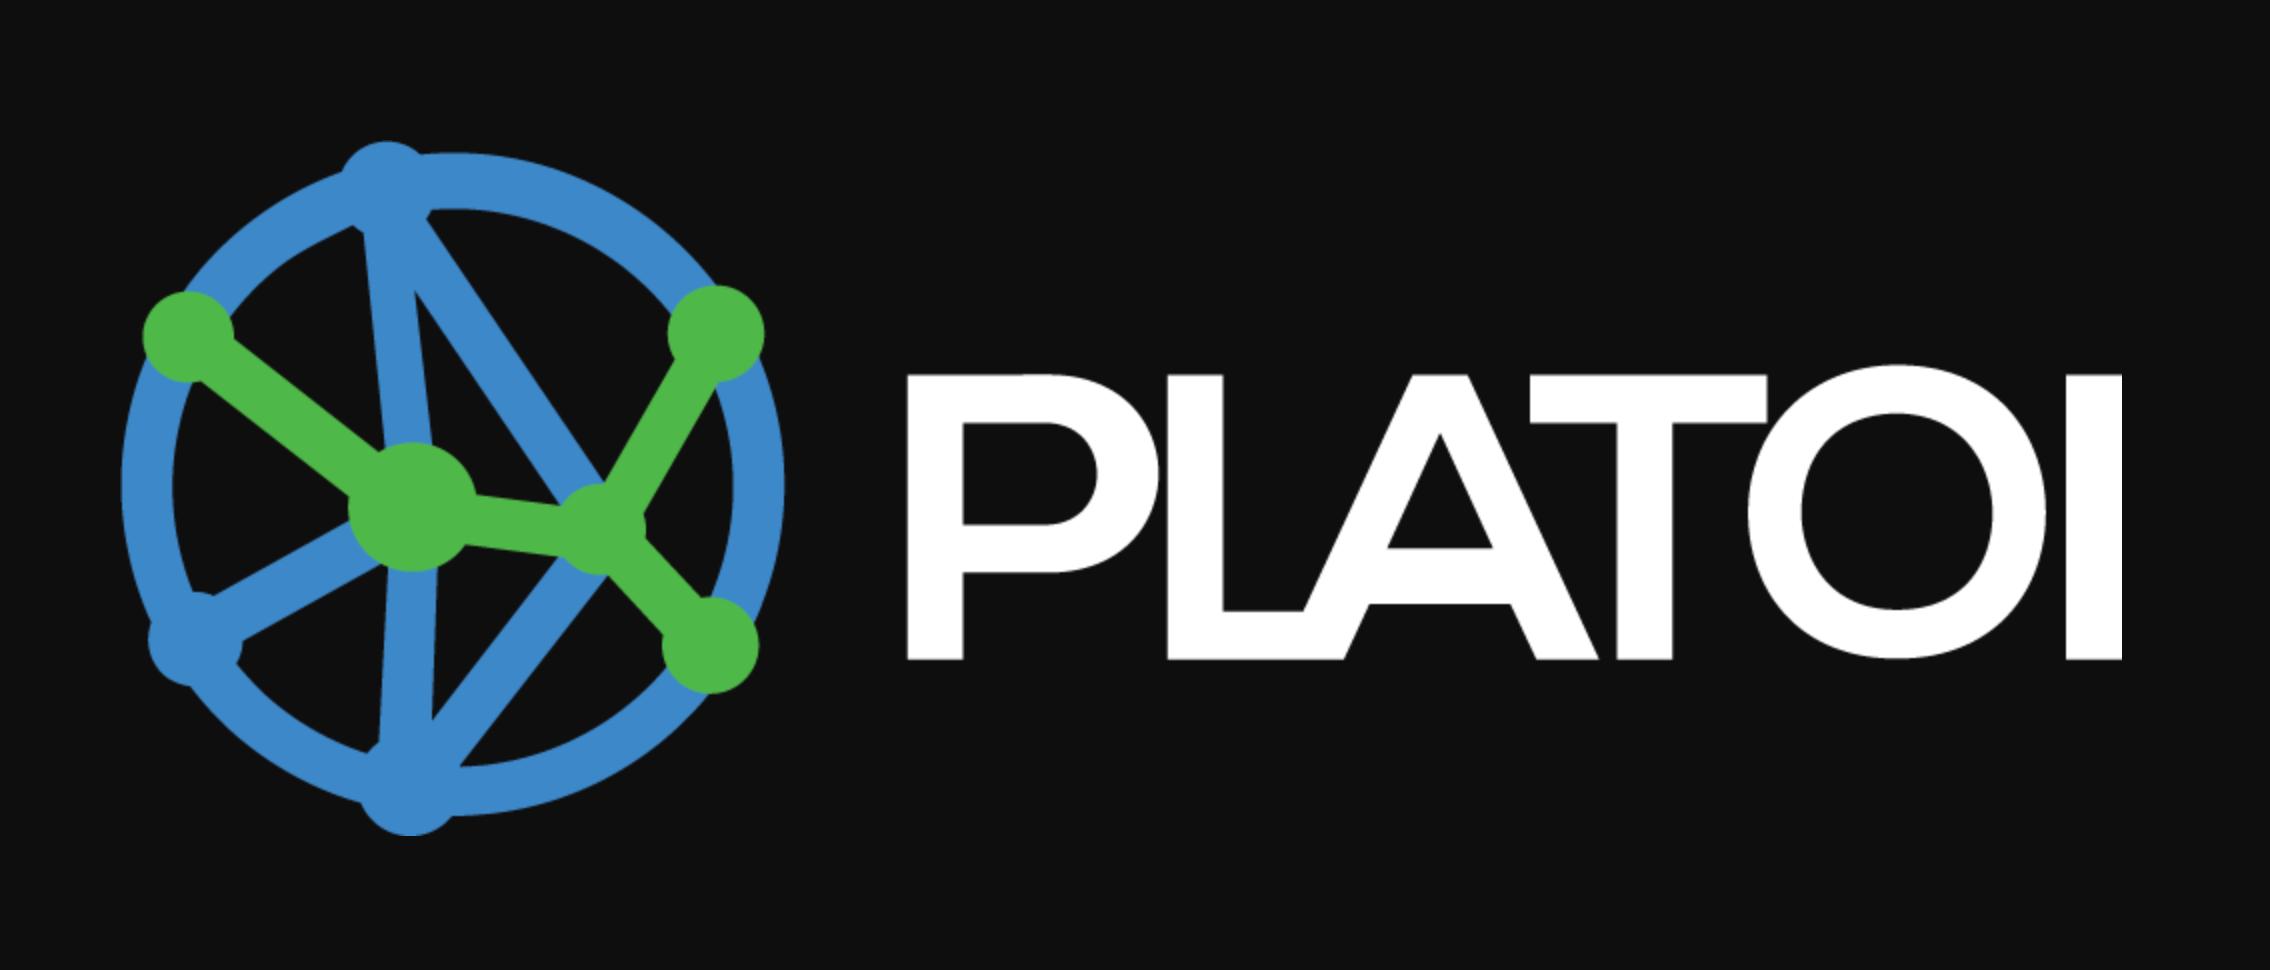 Platoi